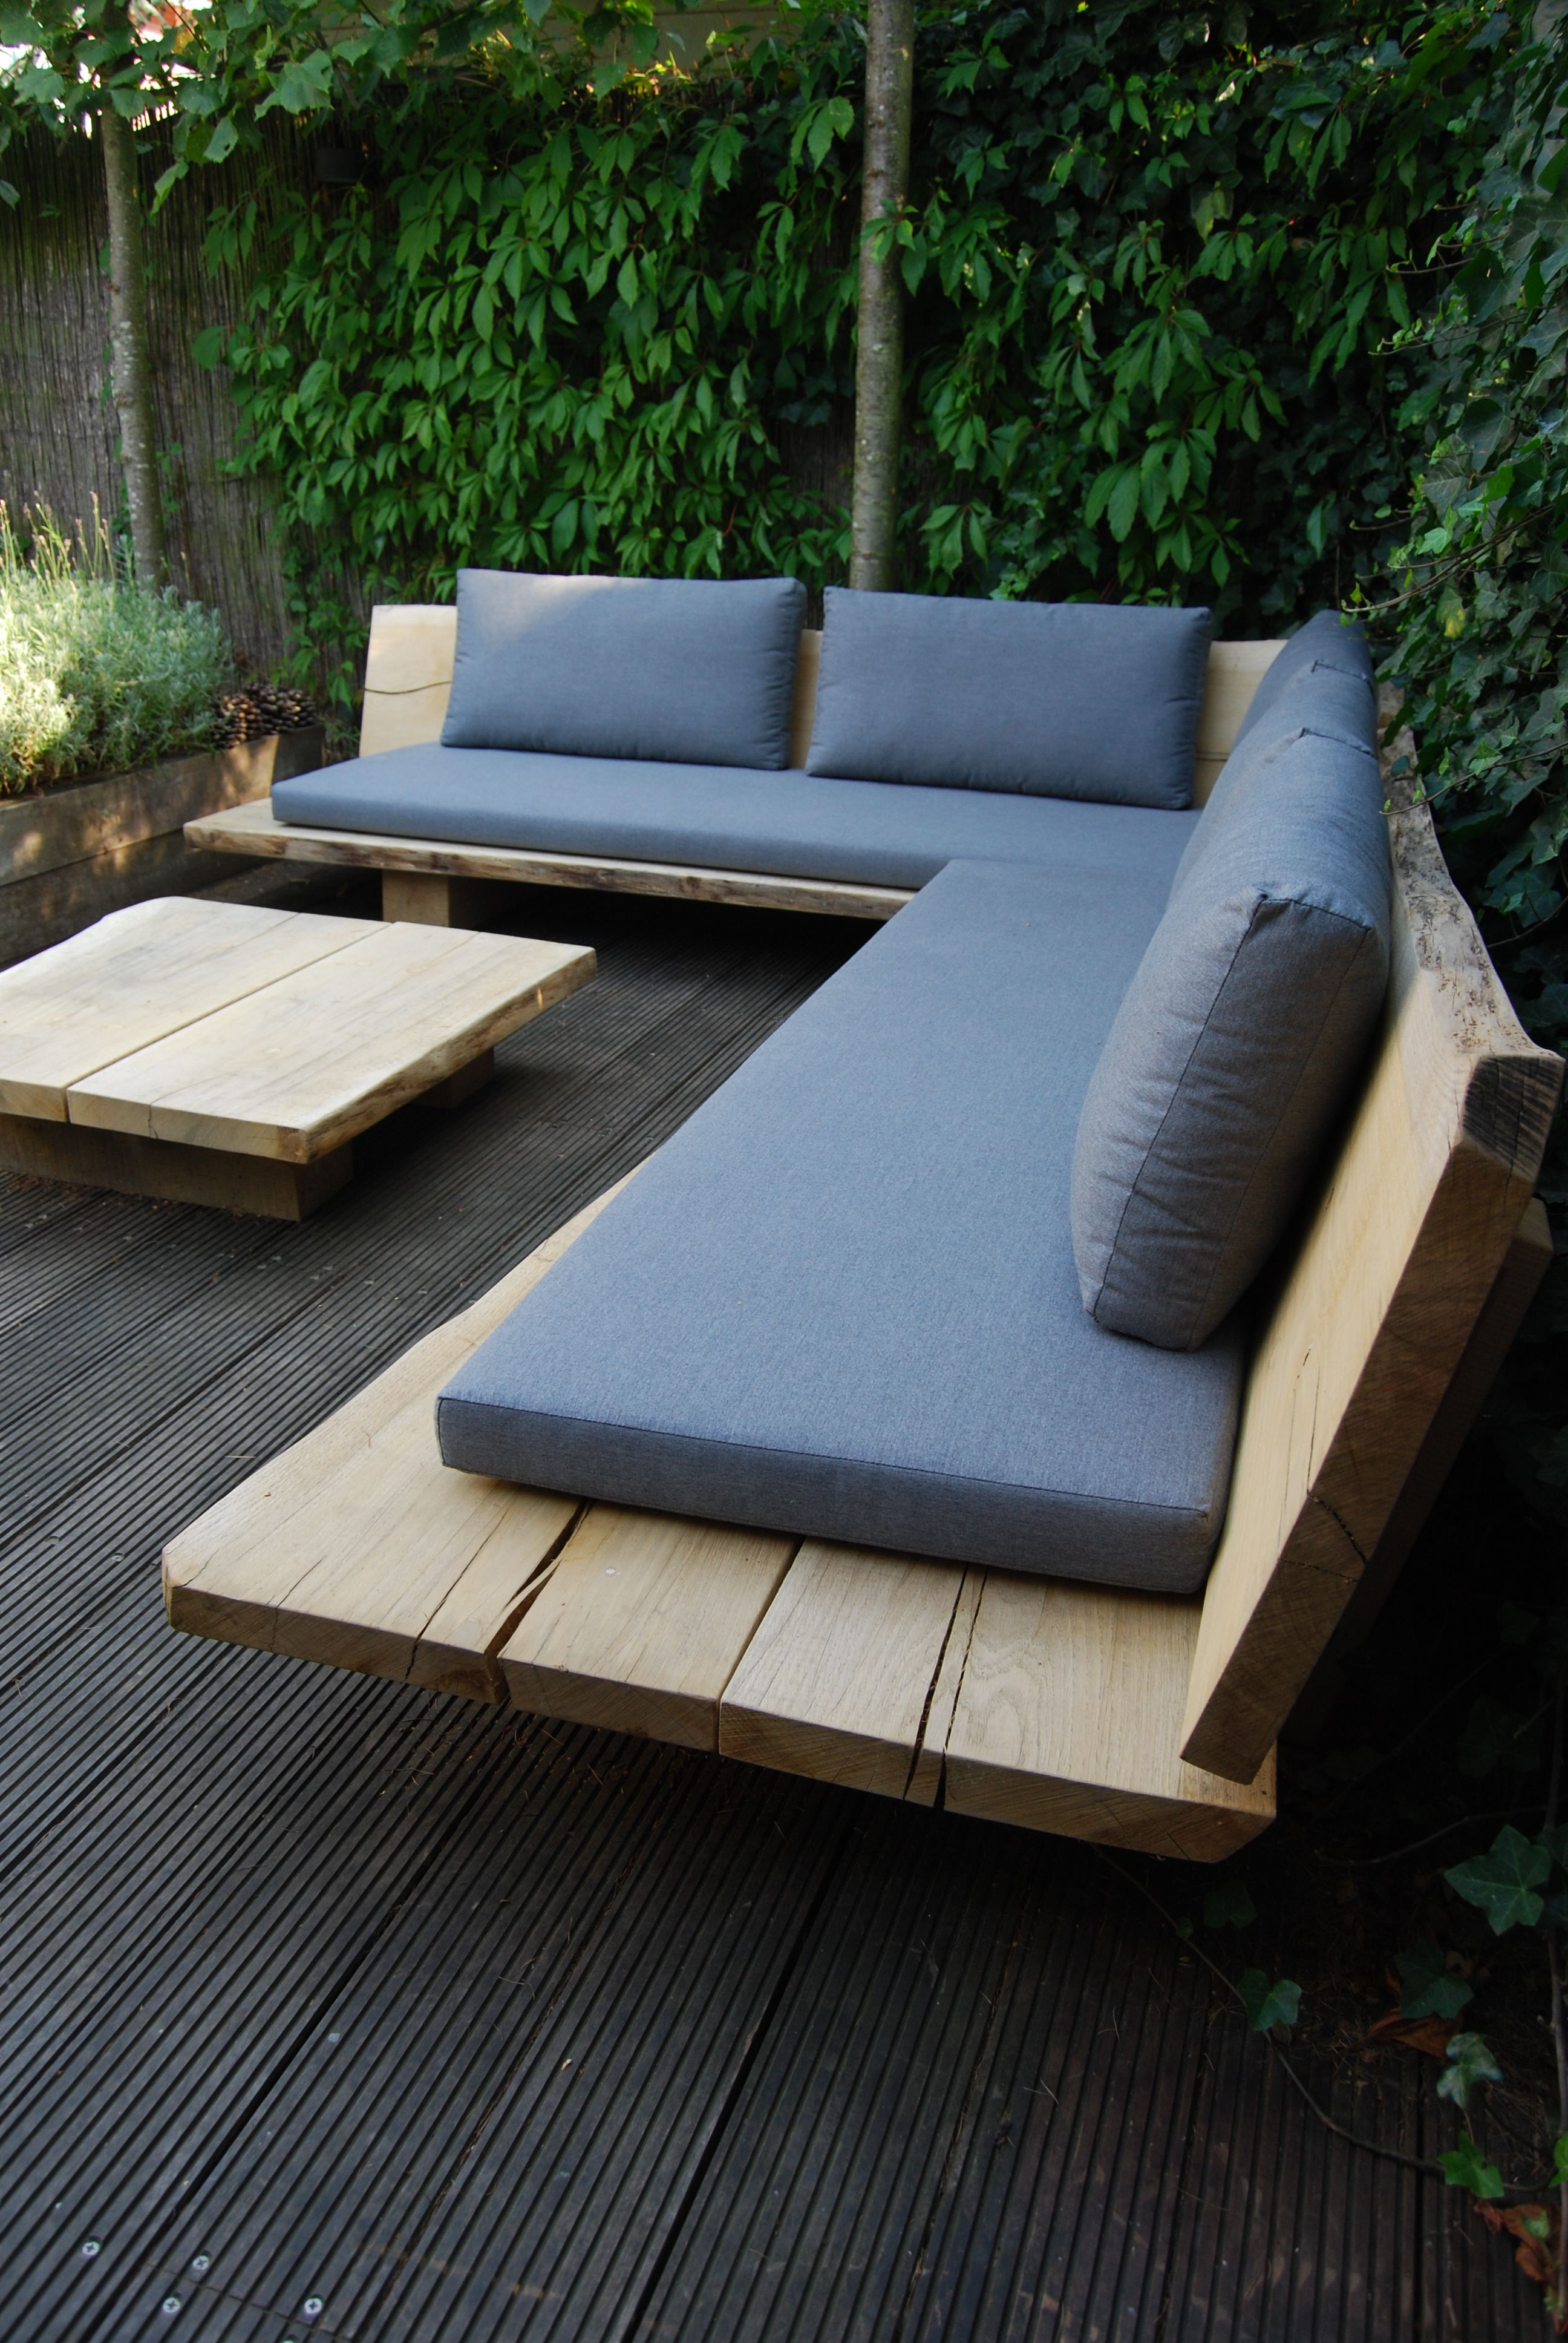 Garden Banch Design Seating Outdoor Couch